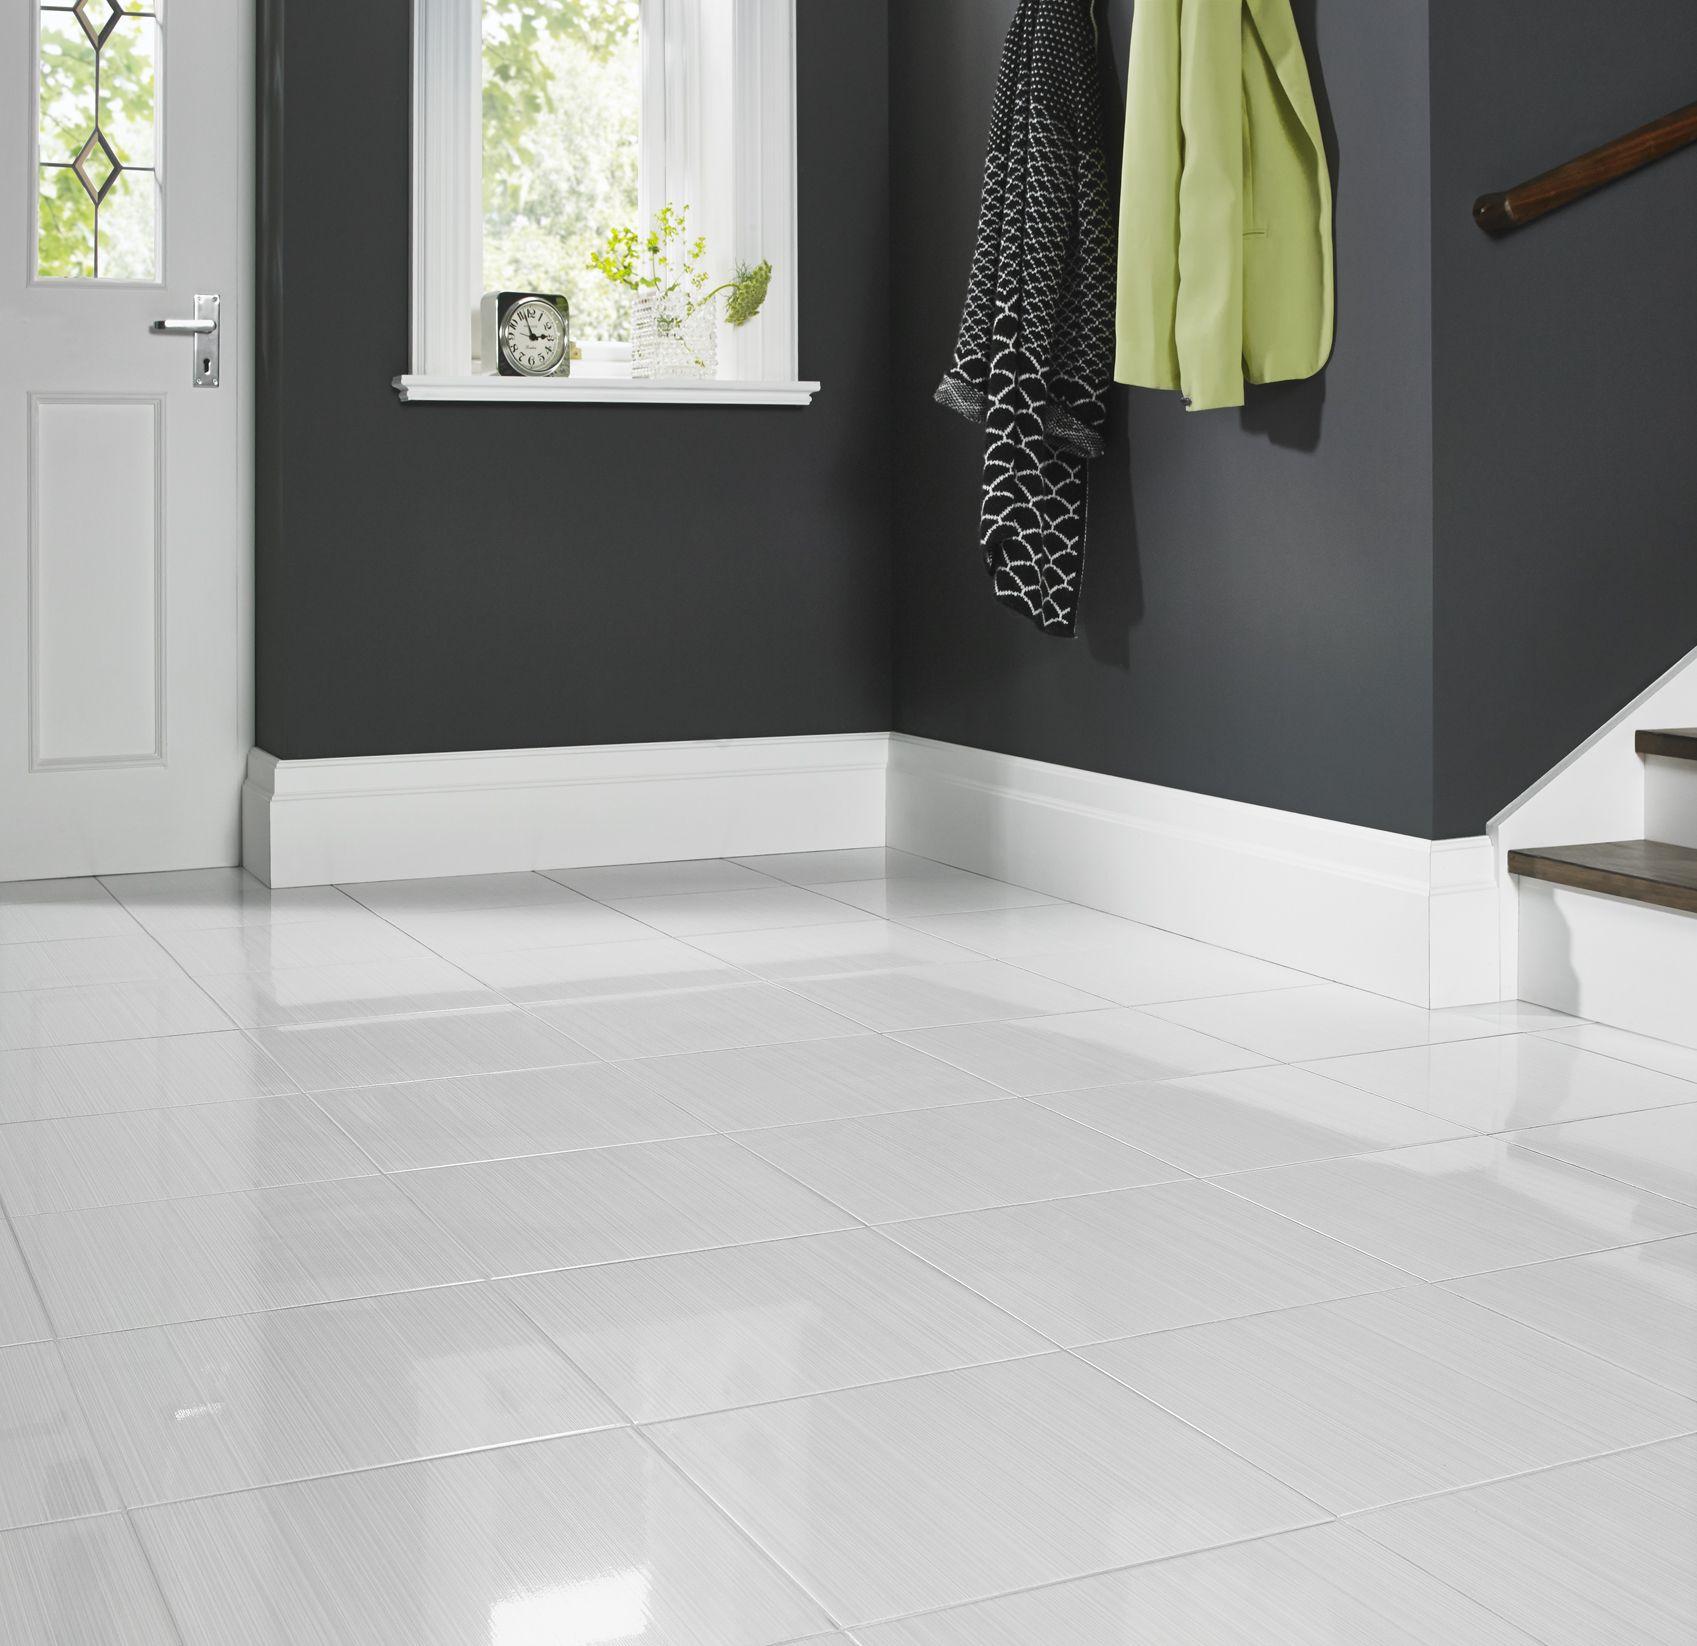 Style Selections Blairlock White Ceramic Floor Tile